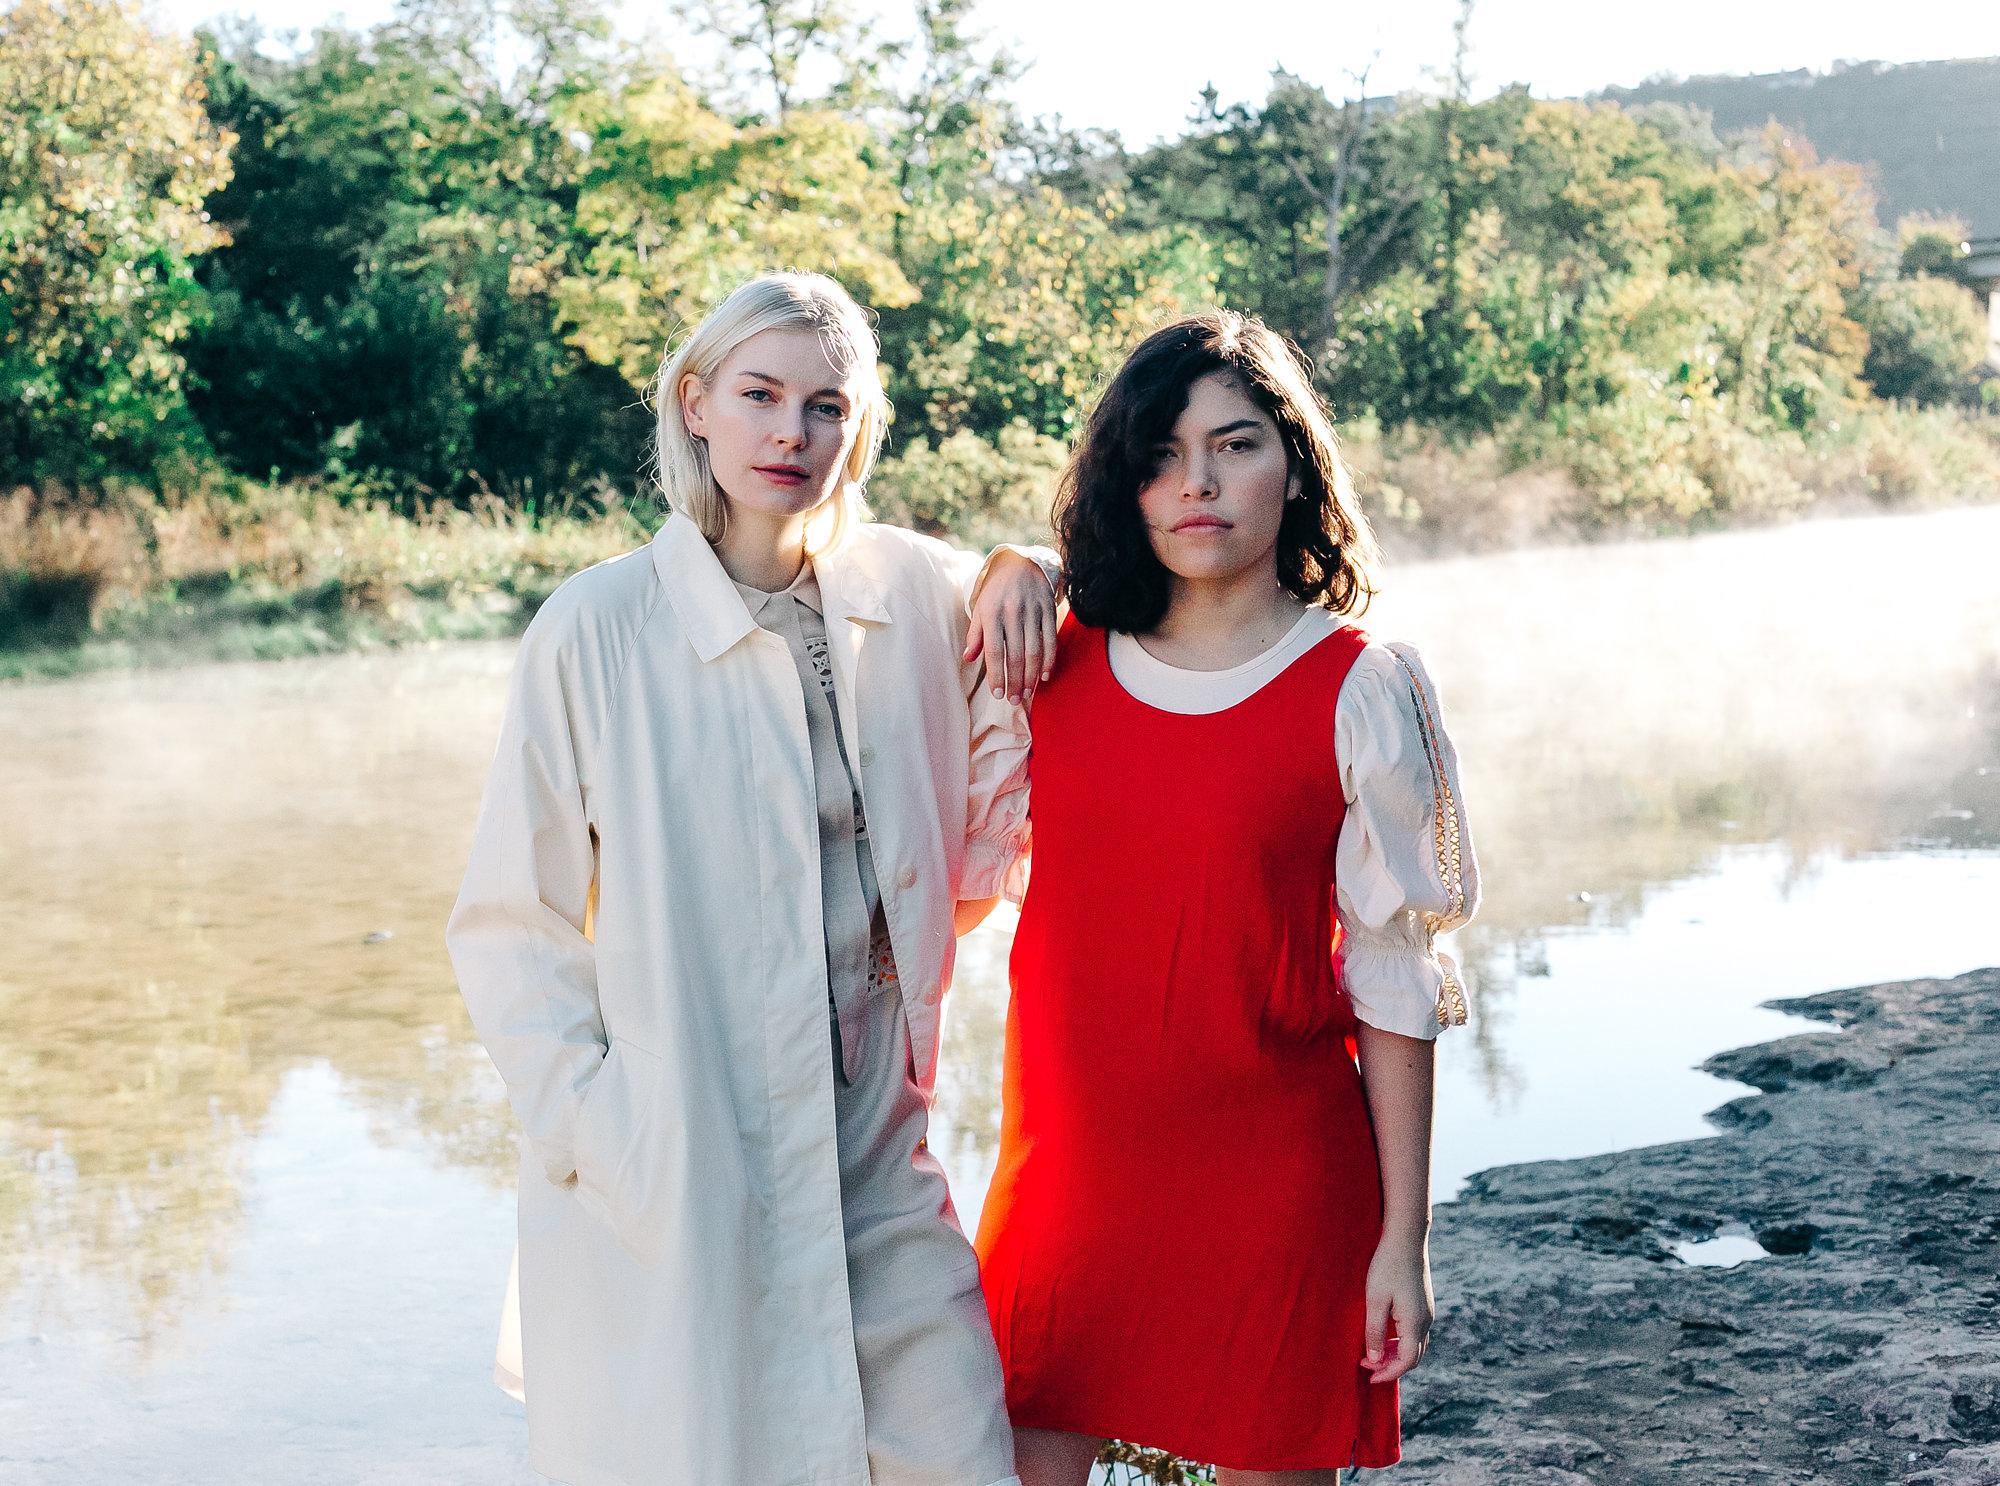 Pieceology-Vintage-1990s-Red-Minimal-Sleeveless-Dress-1.jpg